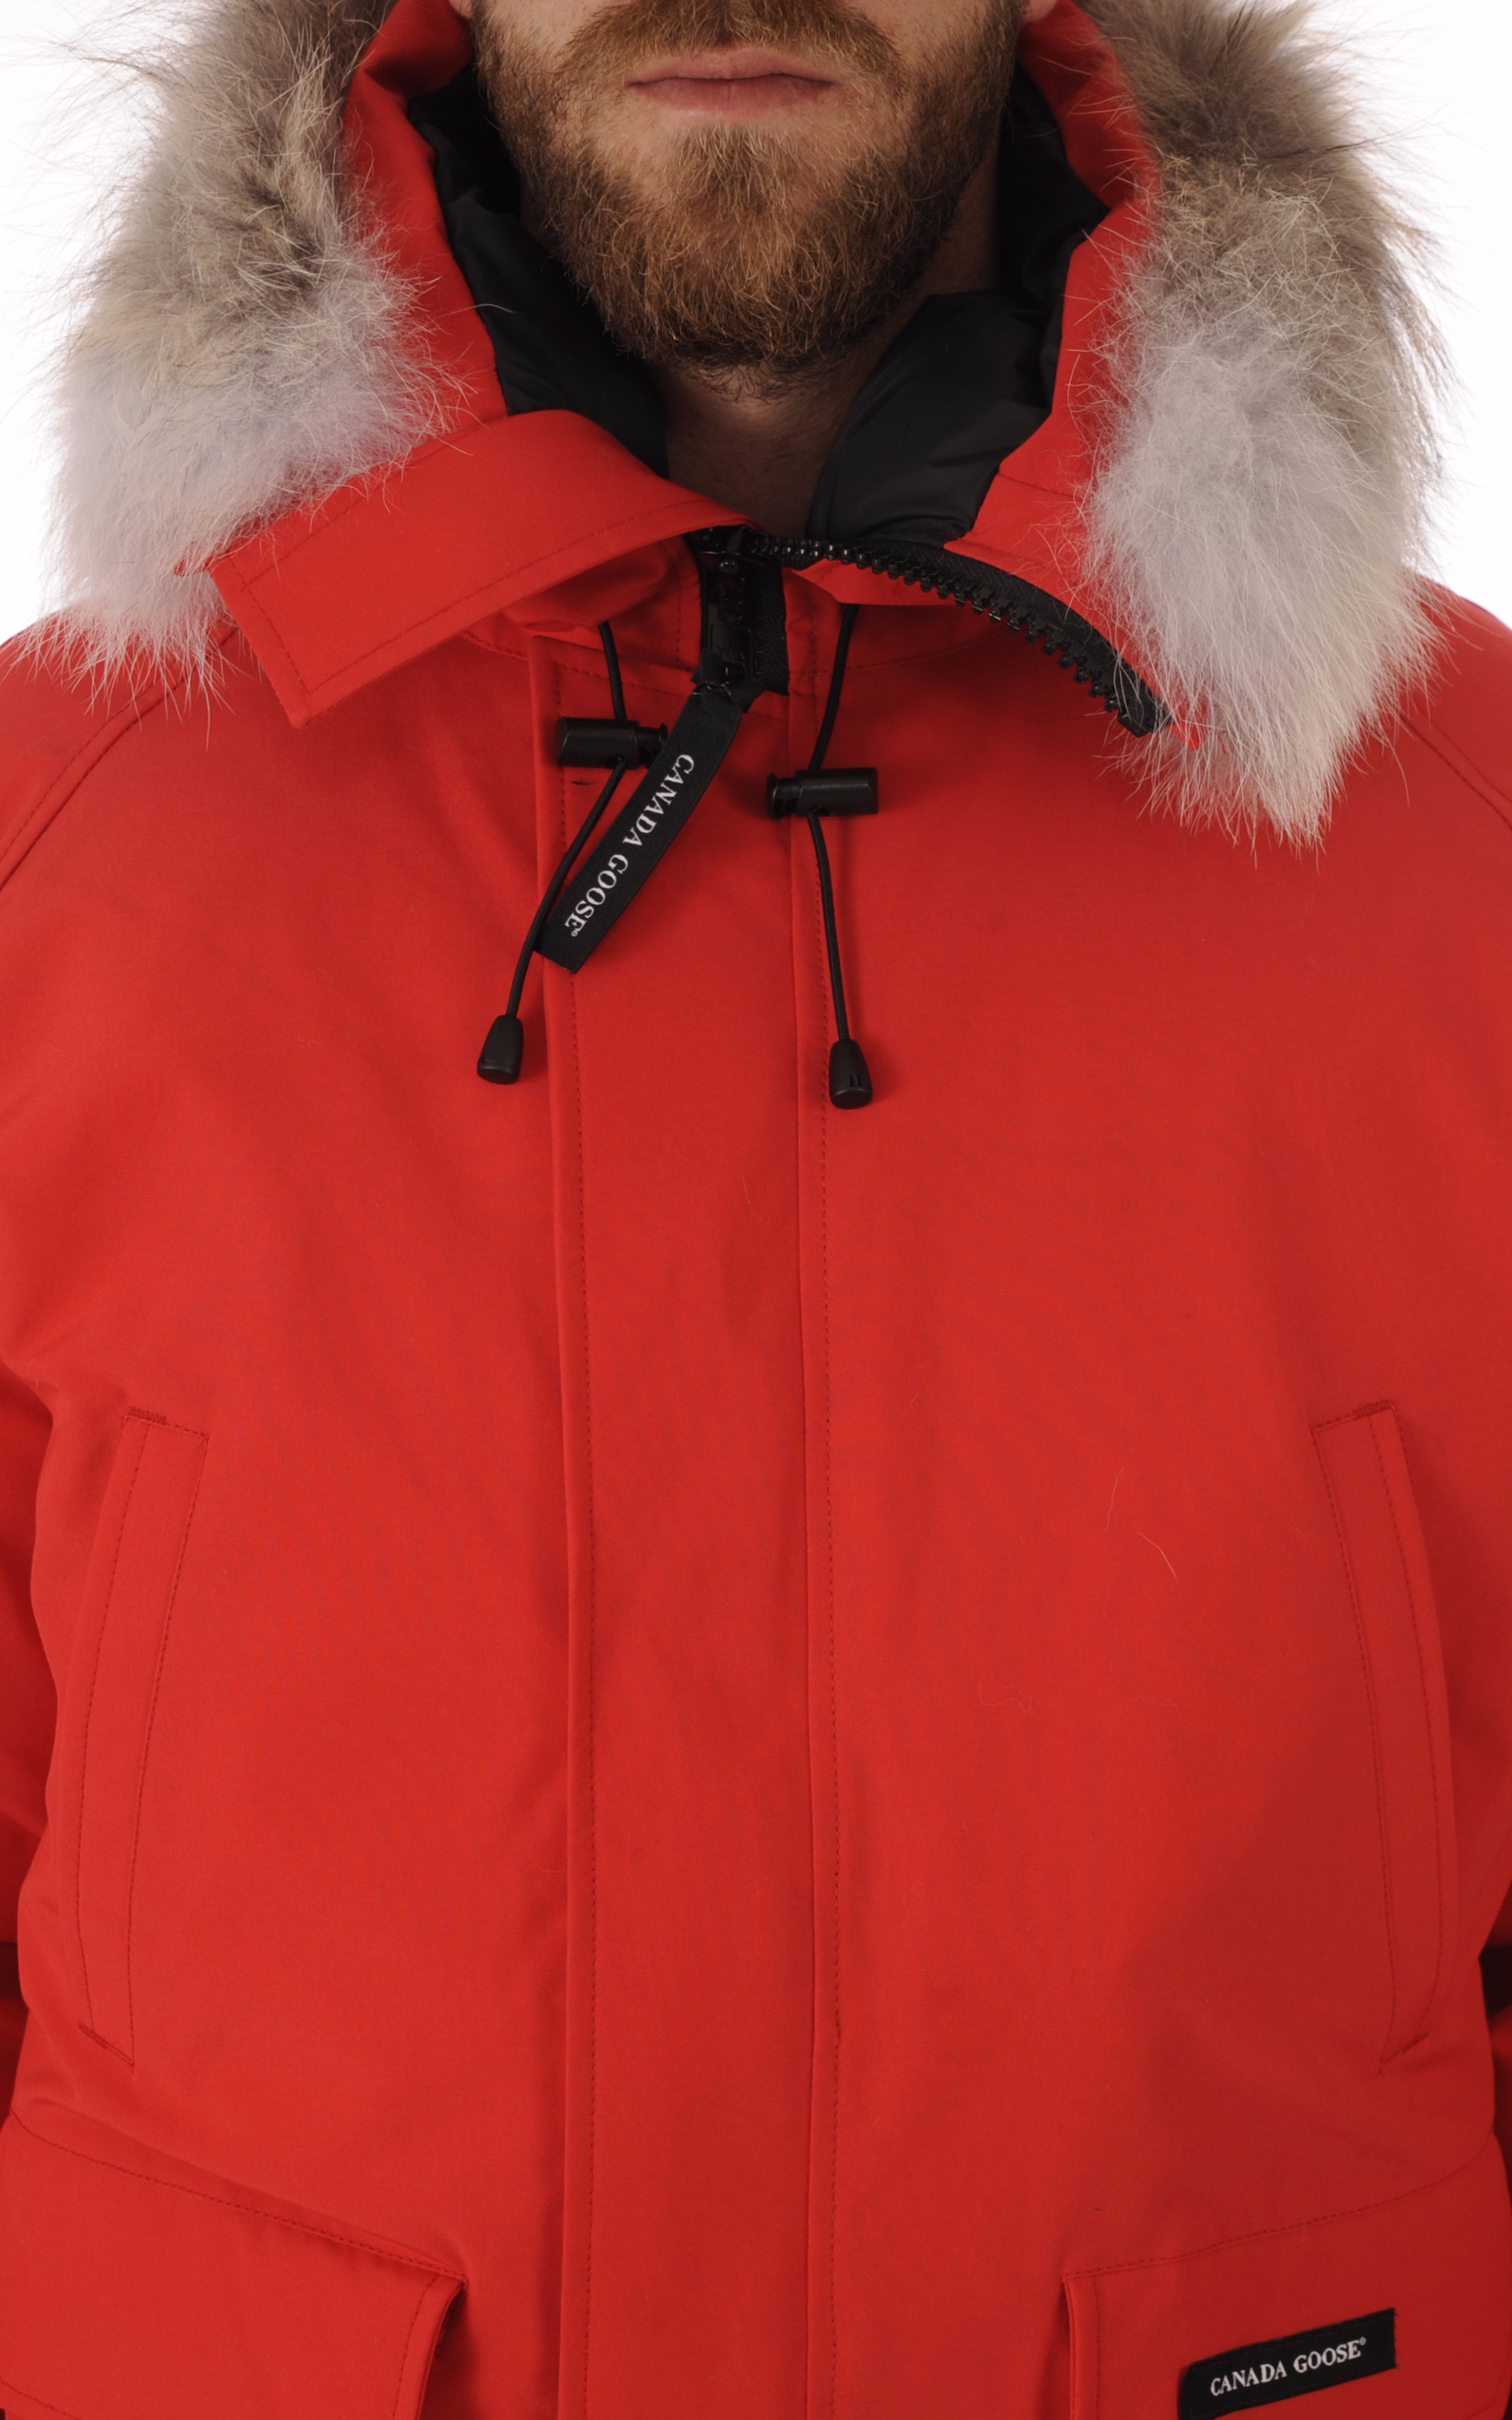 Blouson Chilliwack Rouge Canada Goose